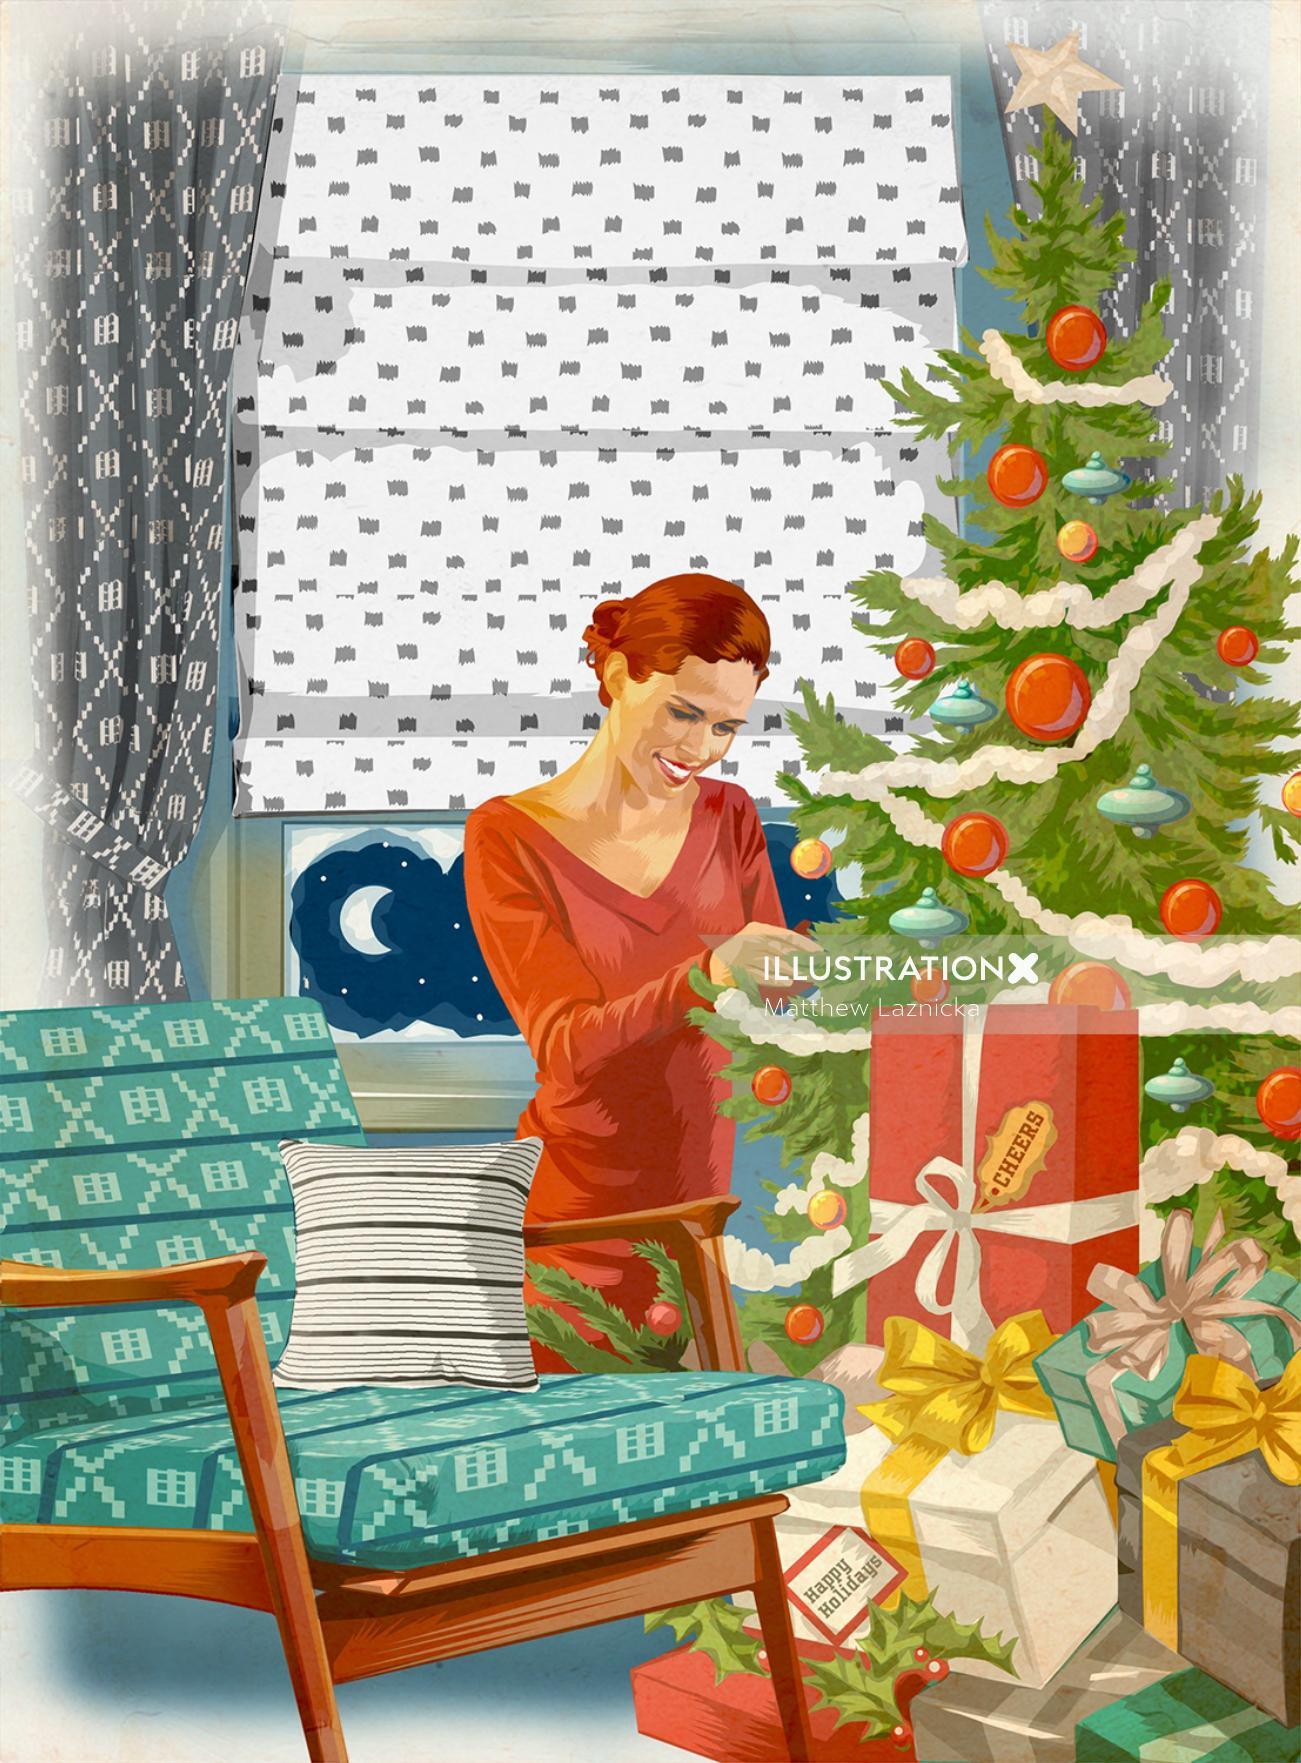 Digital painting of Christmas tree decoration